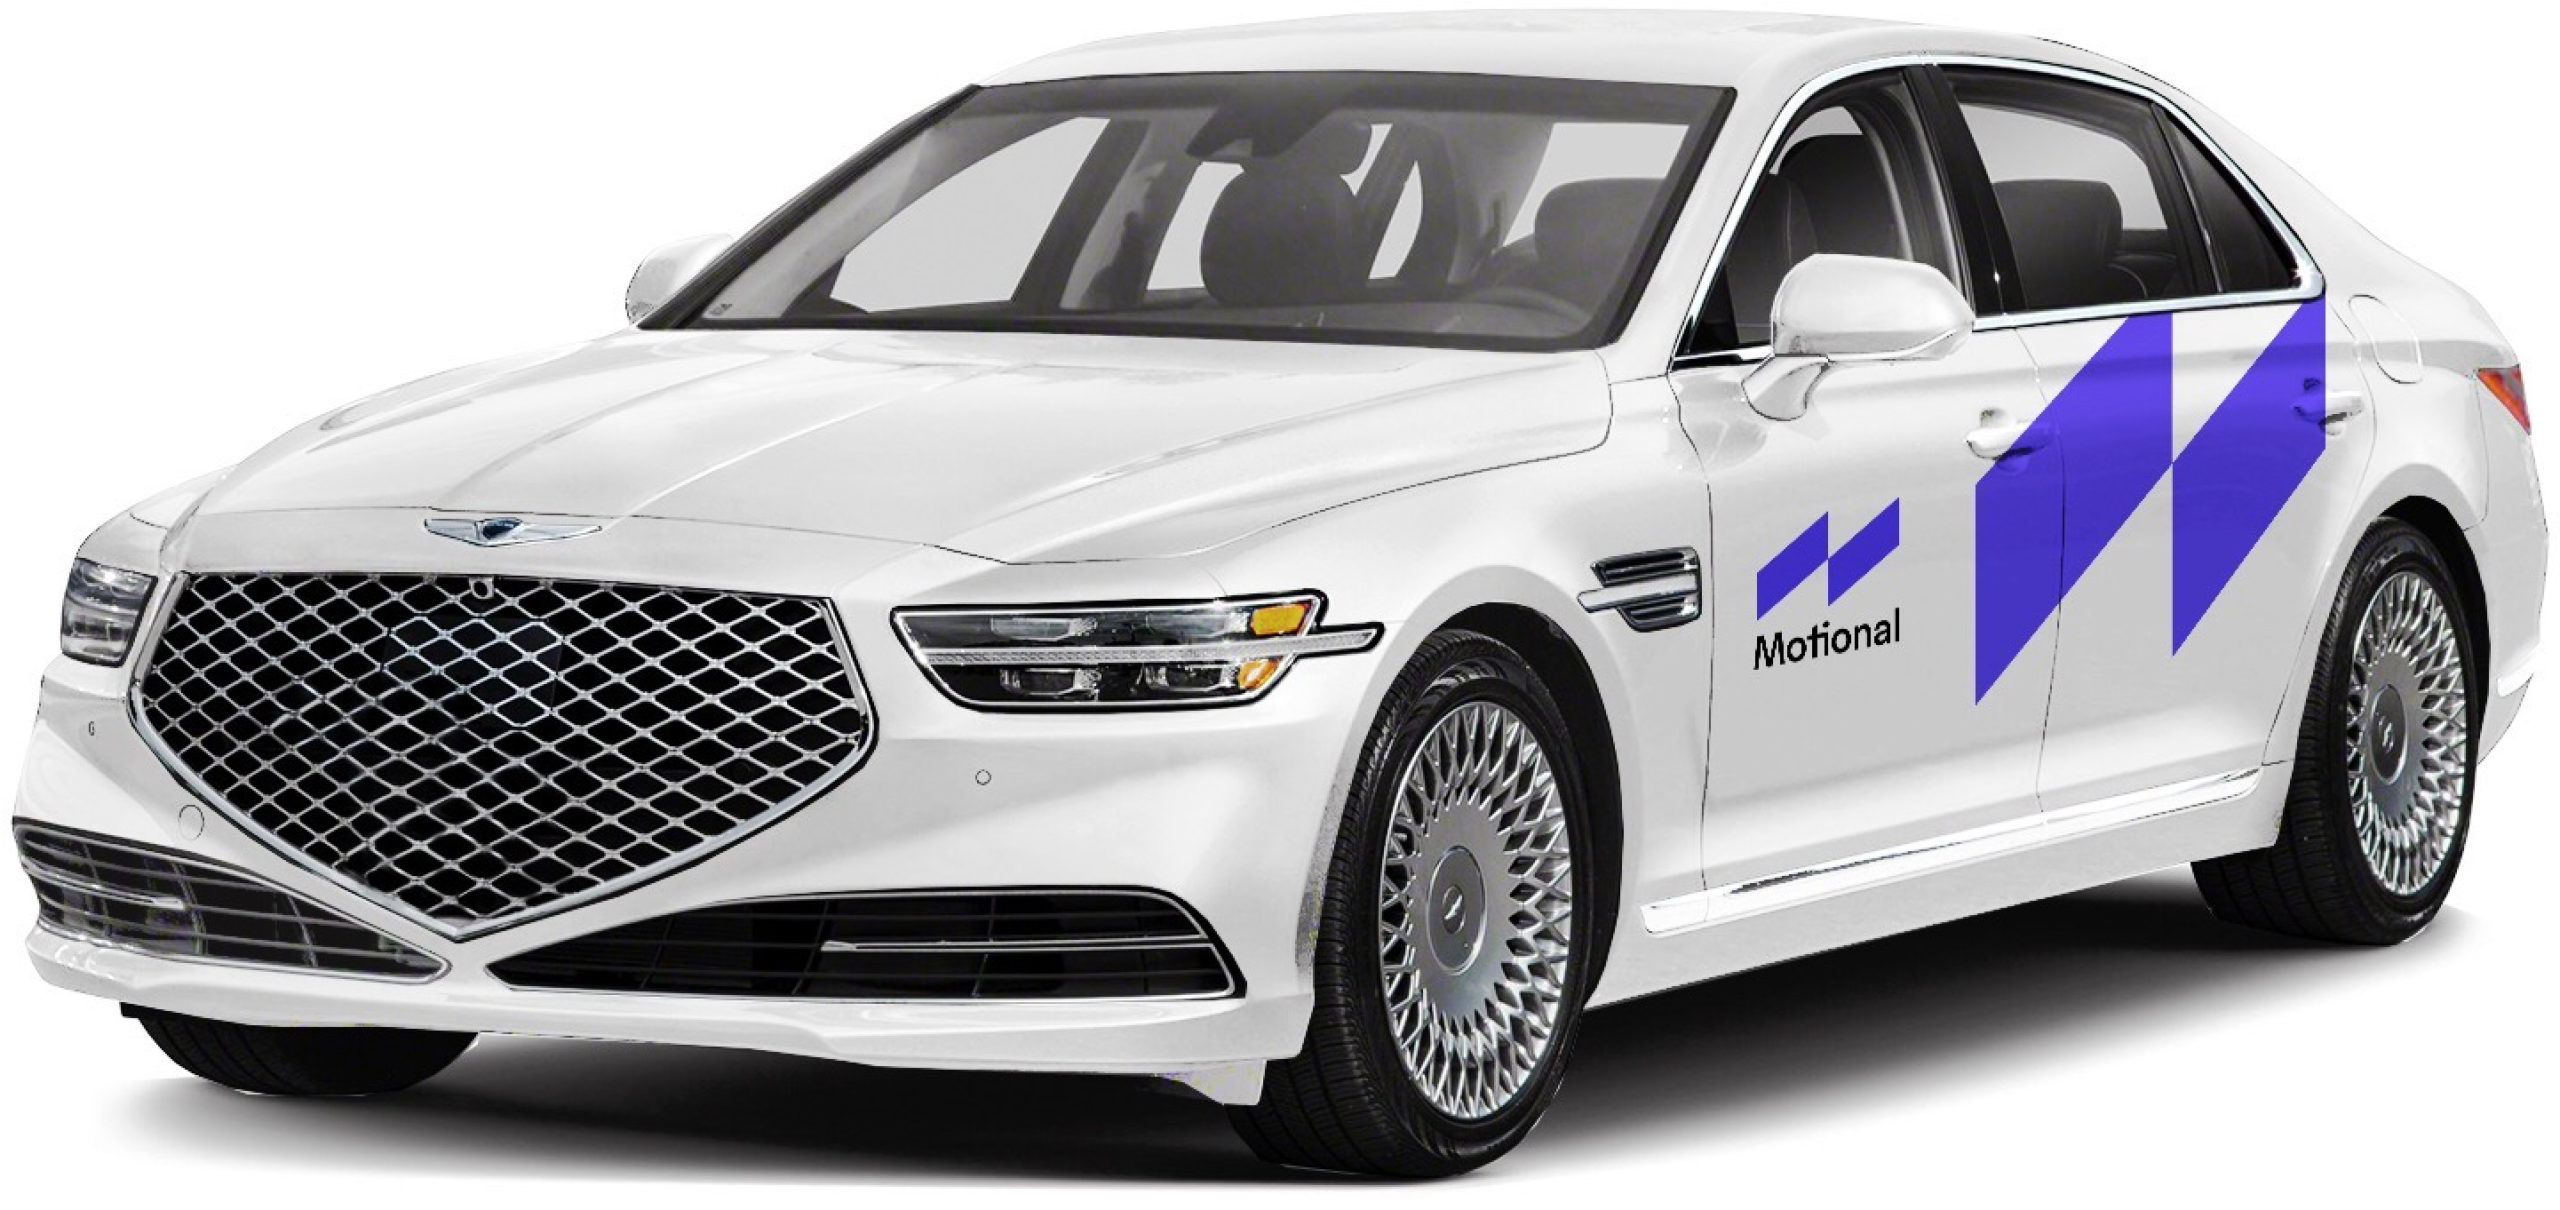 Masinile autonome fara sofer care se vor lansa in Statele Unite in viitor